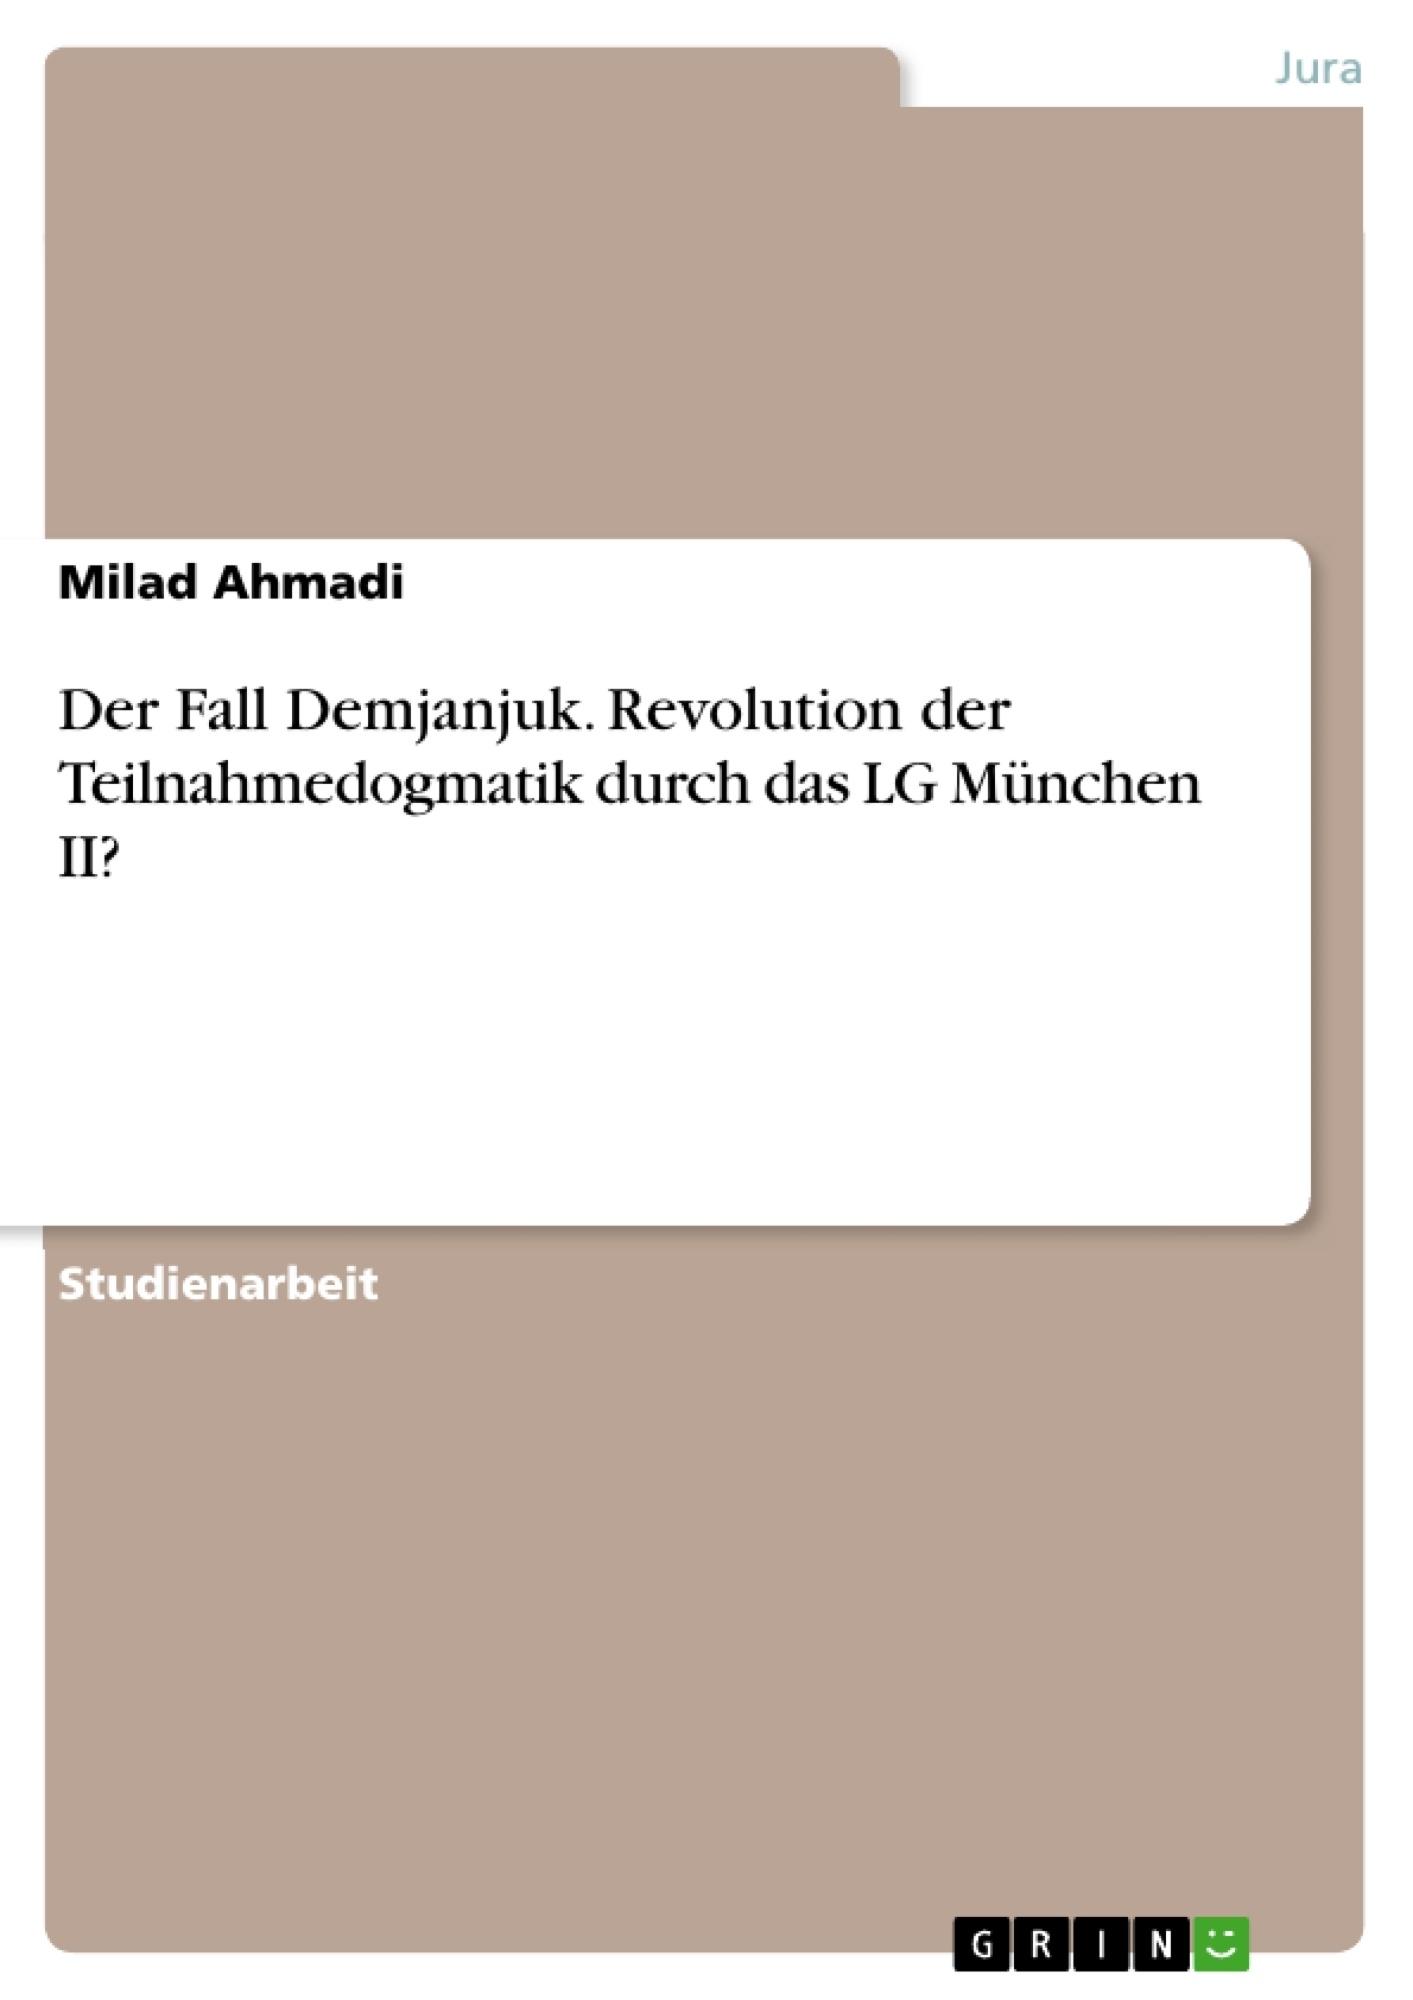 Titel: Der Fall Demjanjuk. Revolution der Teilnahmedogmatik durch das LG München II?